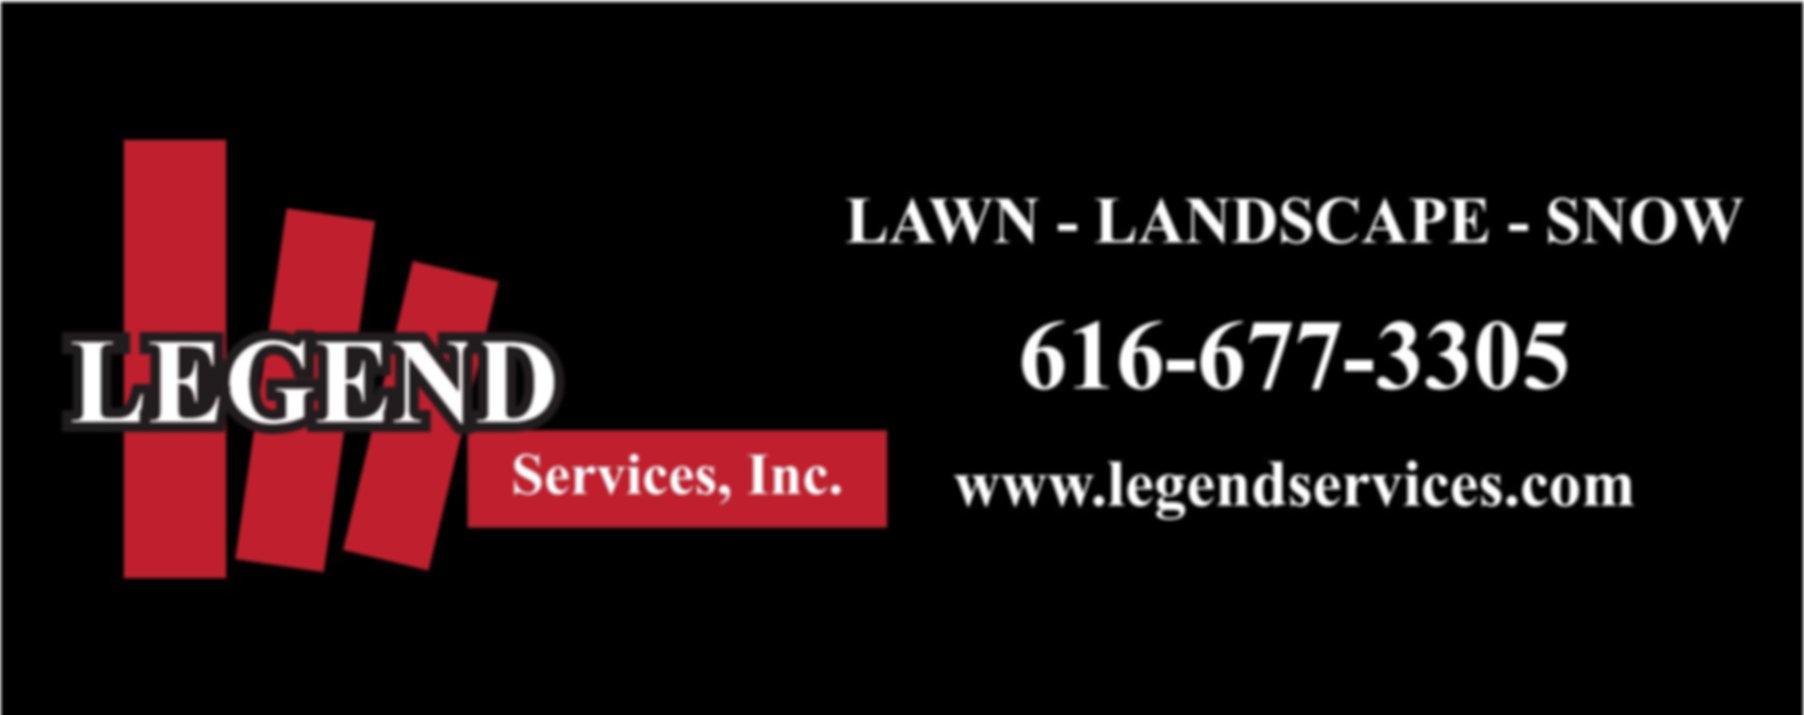 Lawn care Trailer.JPG